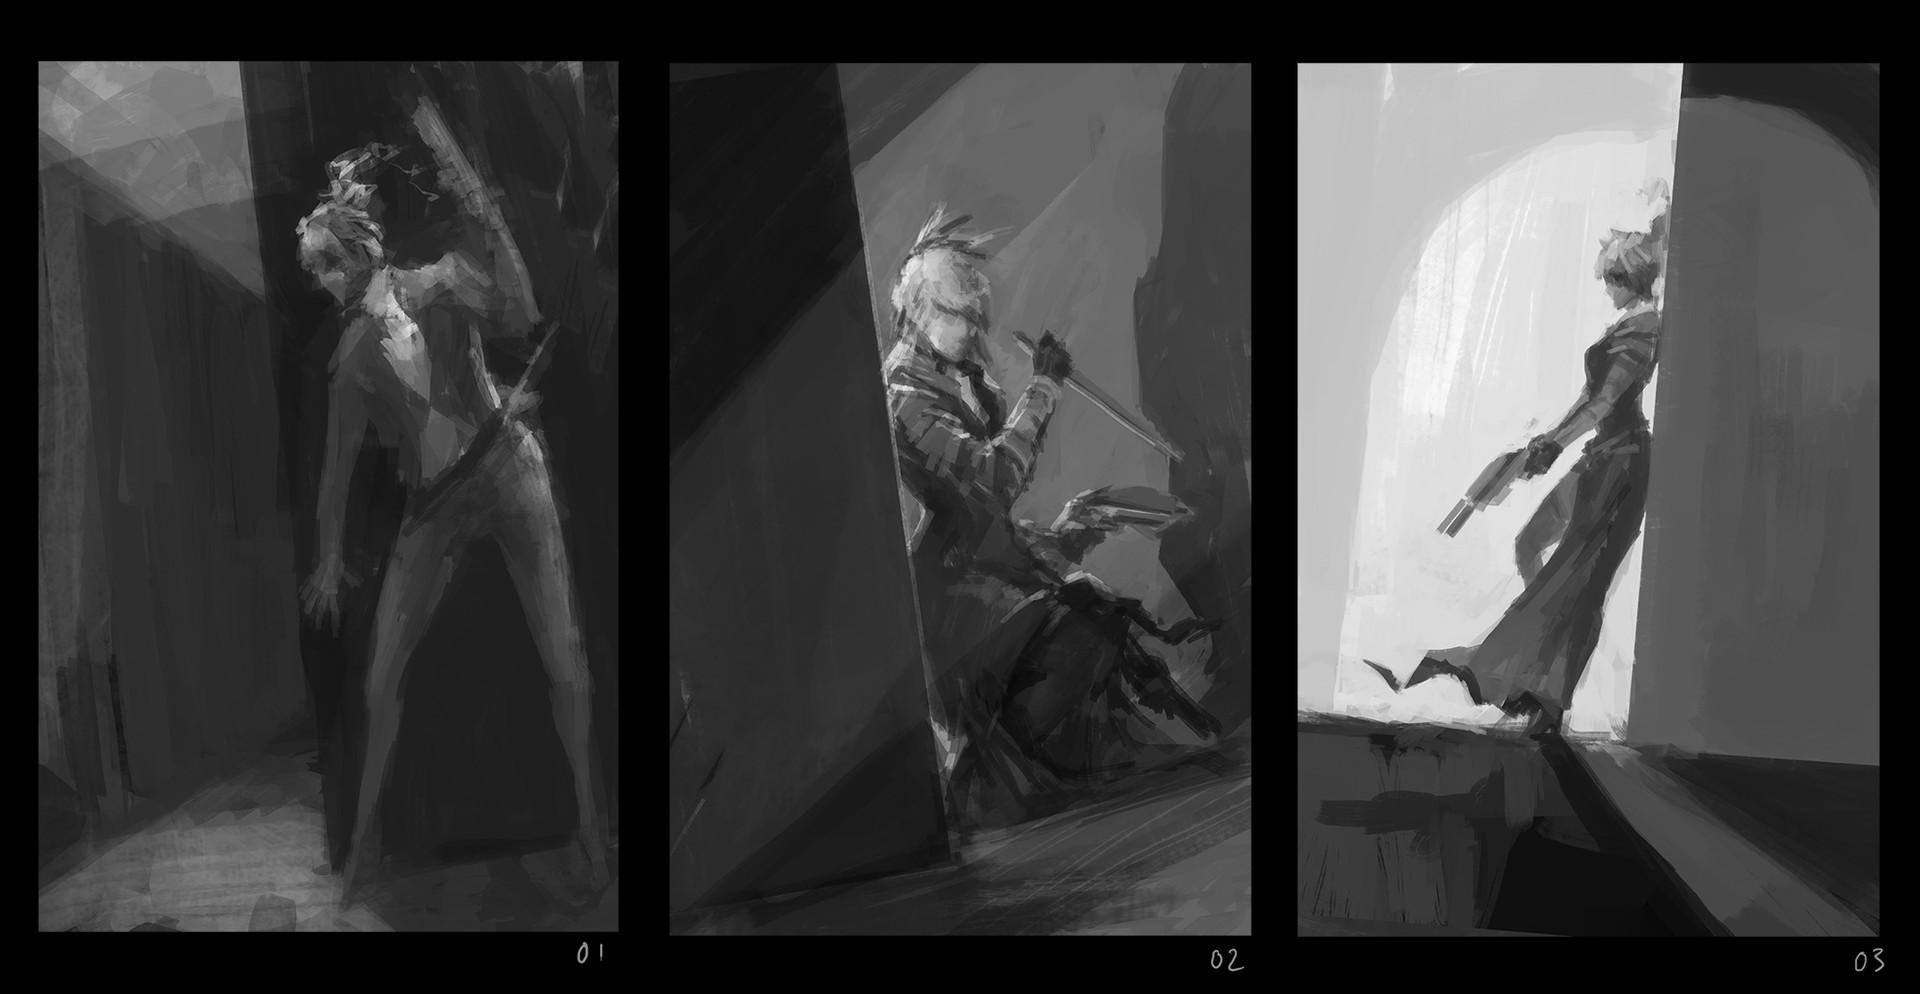 Alexandre chaudret dos shade 01 sketches